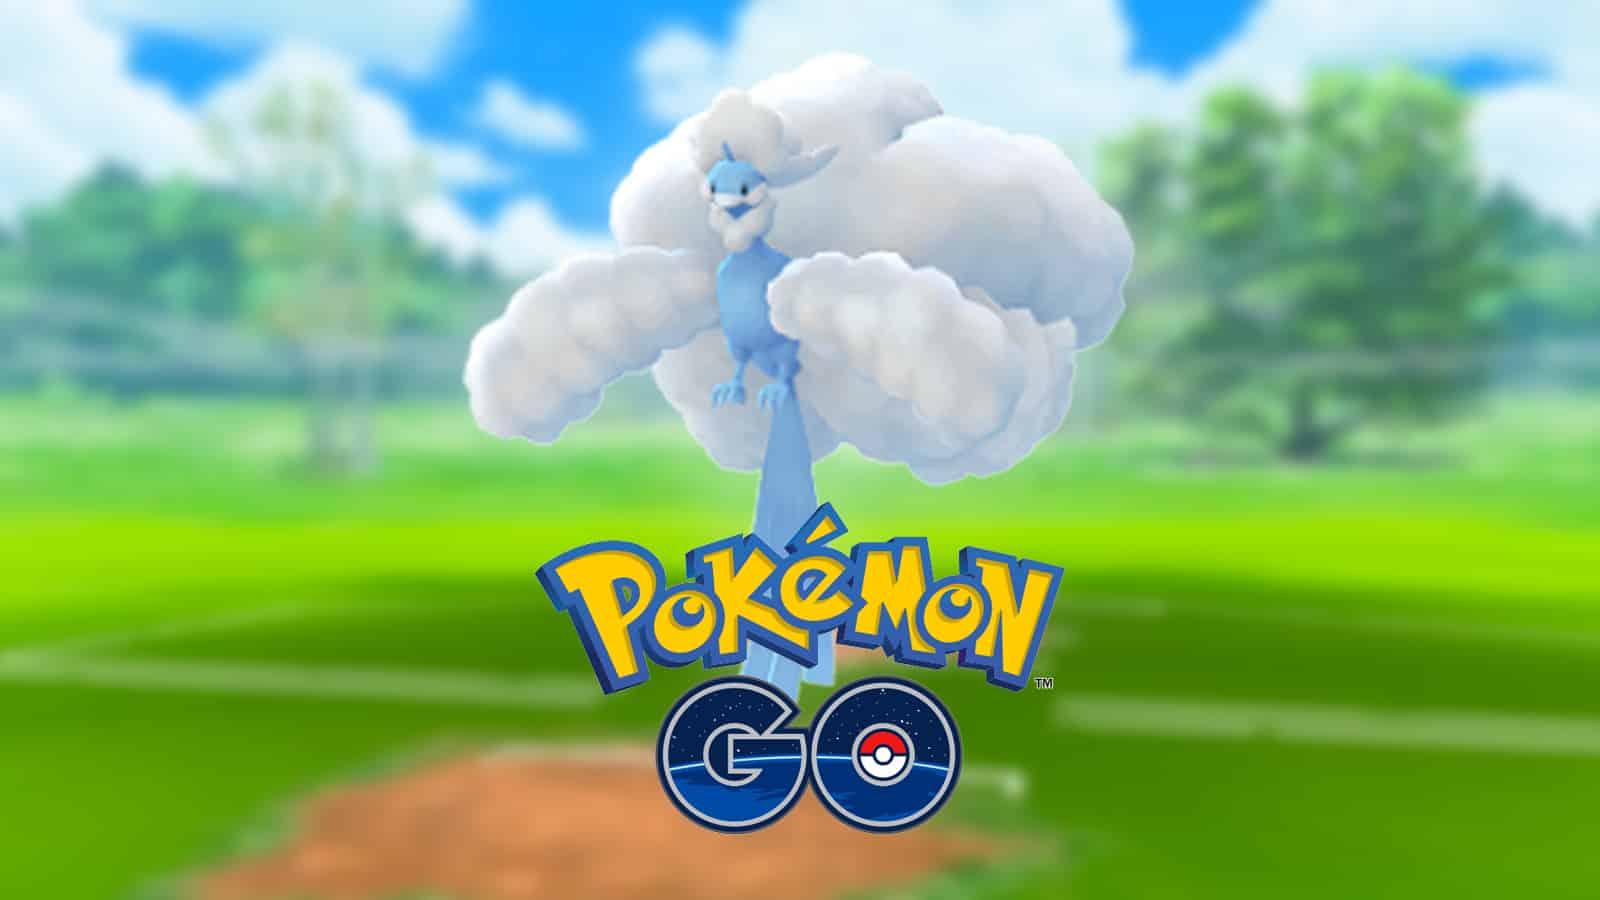 Pokemon-Go-Mega-Altaria-Counters-Movesets-Weaknesses